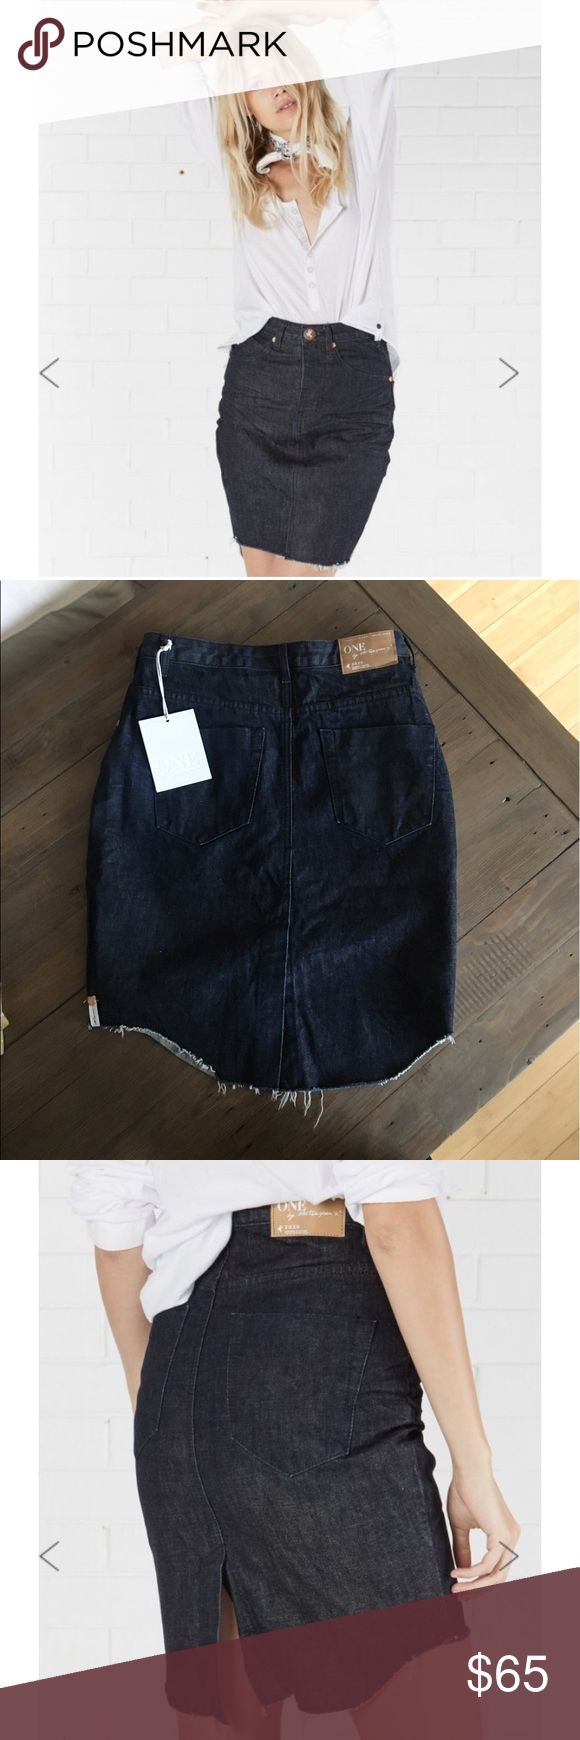 One Teaspoon 2020 Skirt One Teaspoon 2020 dark wash frayed skirt. Mid to high waist slim fit. Back slit in center. Size 29. One Teaspoon Skirts Midi